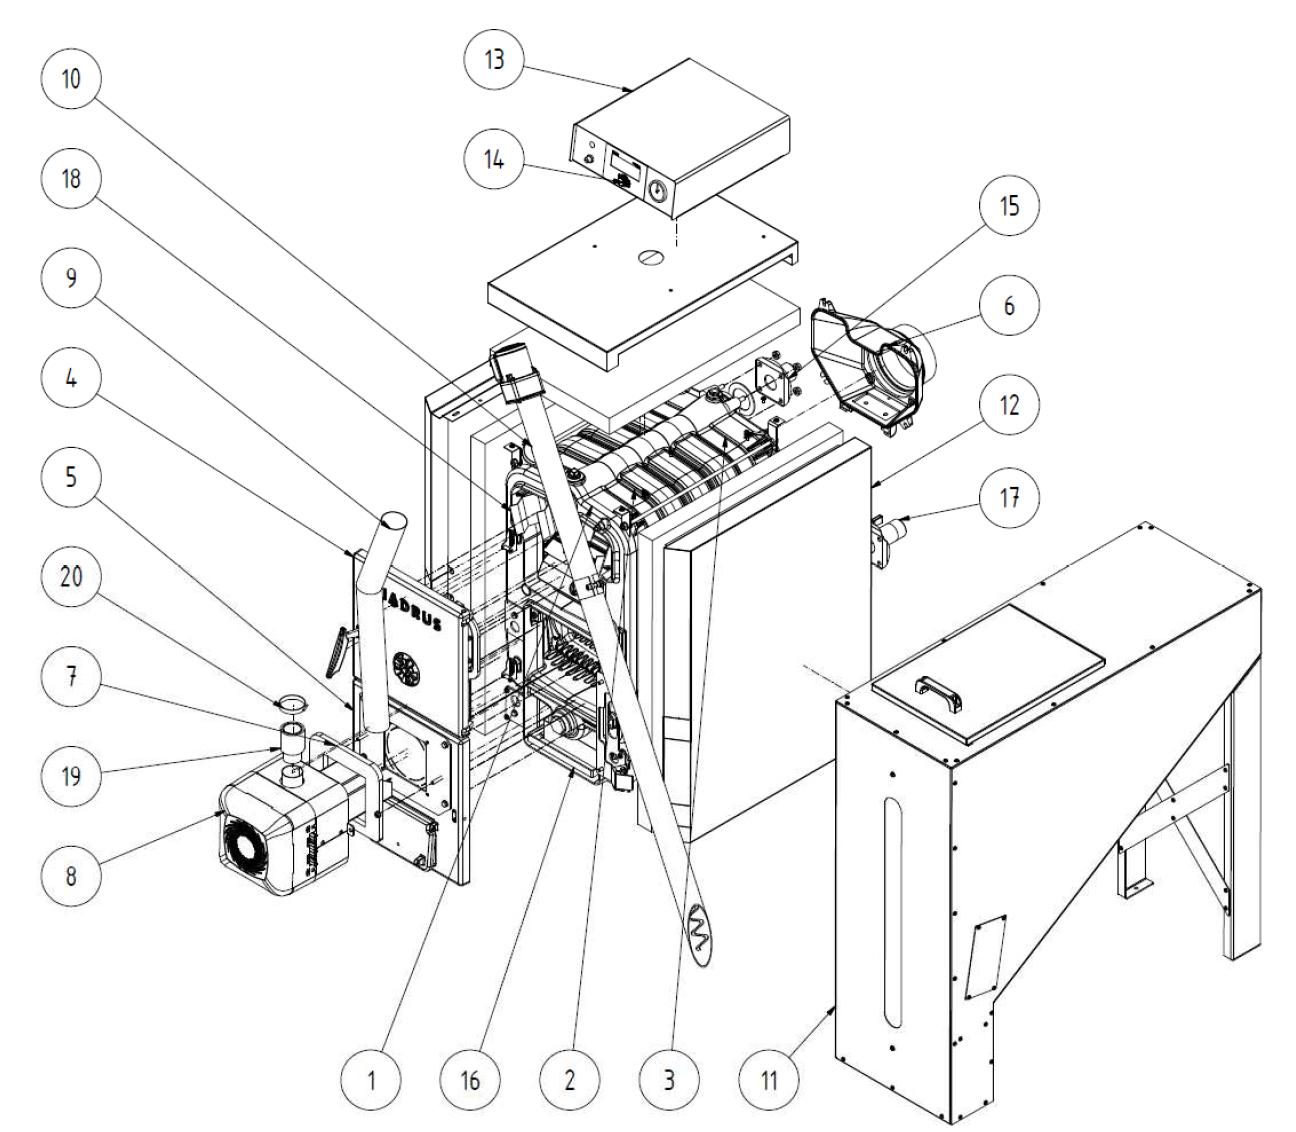 Kessel Viadrus A0C LP - 5 Glieder - 20 kW - Kessel, Heizkessel ...